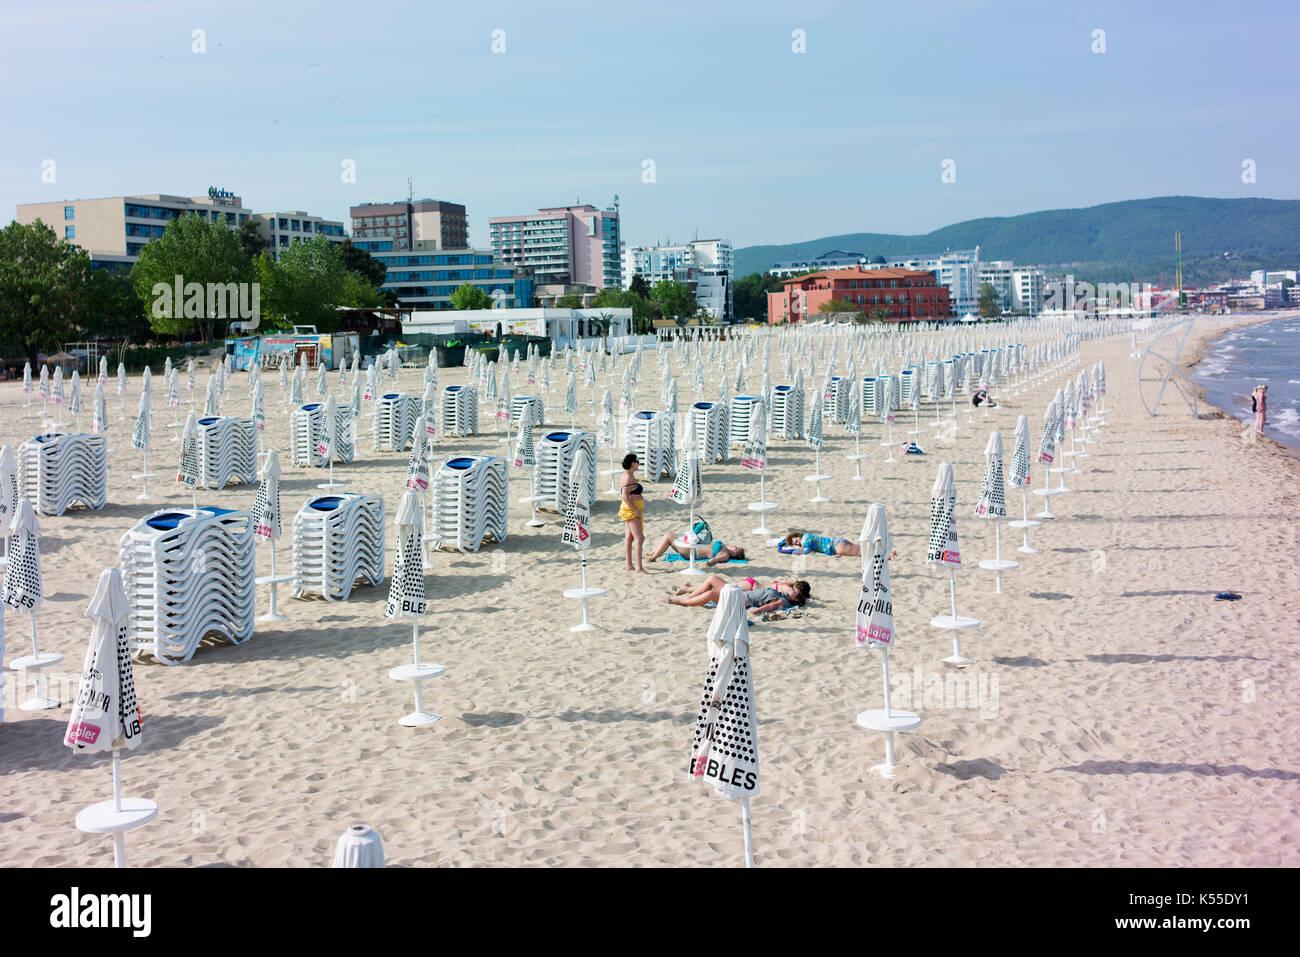 People sunbathe on a near-empty beach at Sunny Beach well before high season. - Stock Image